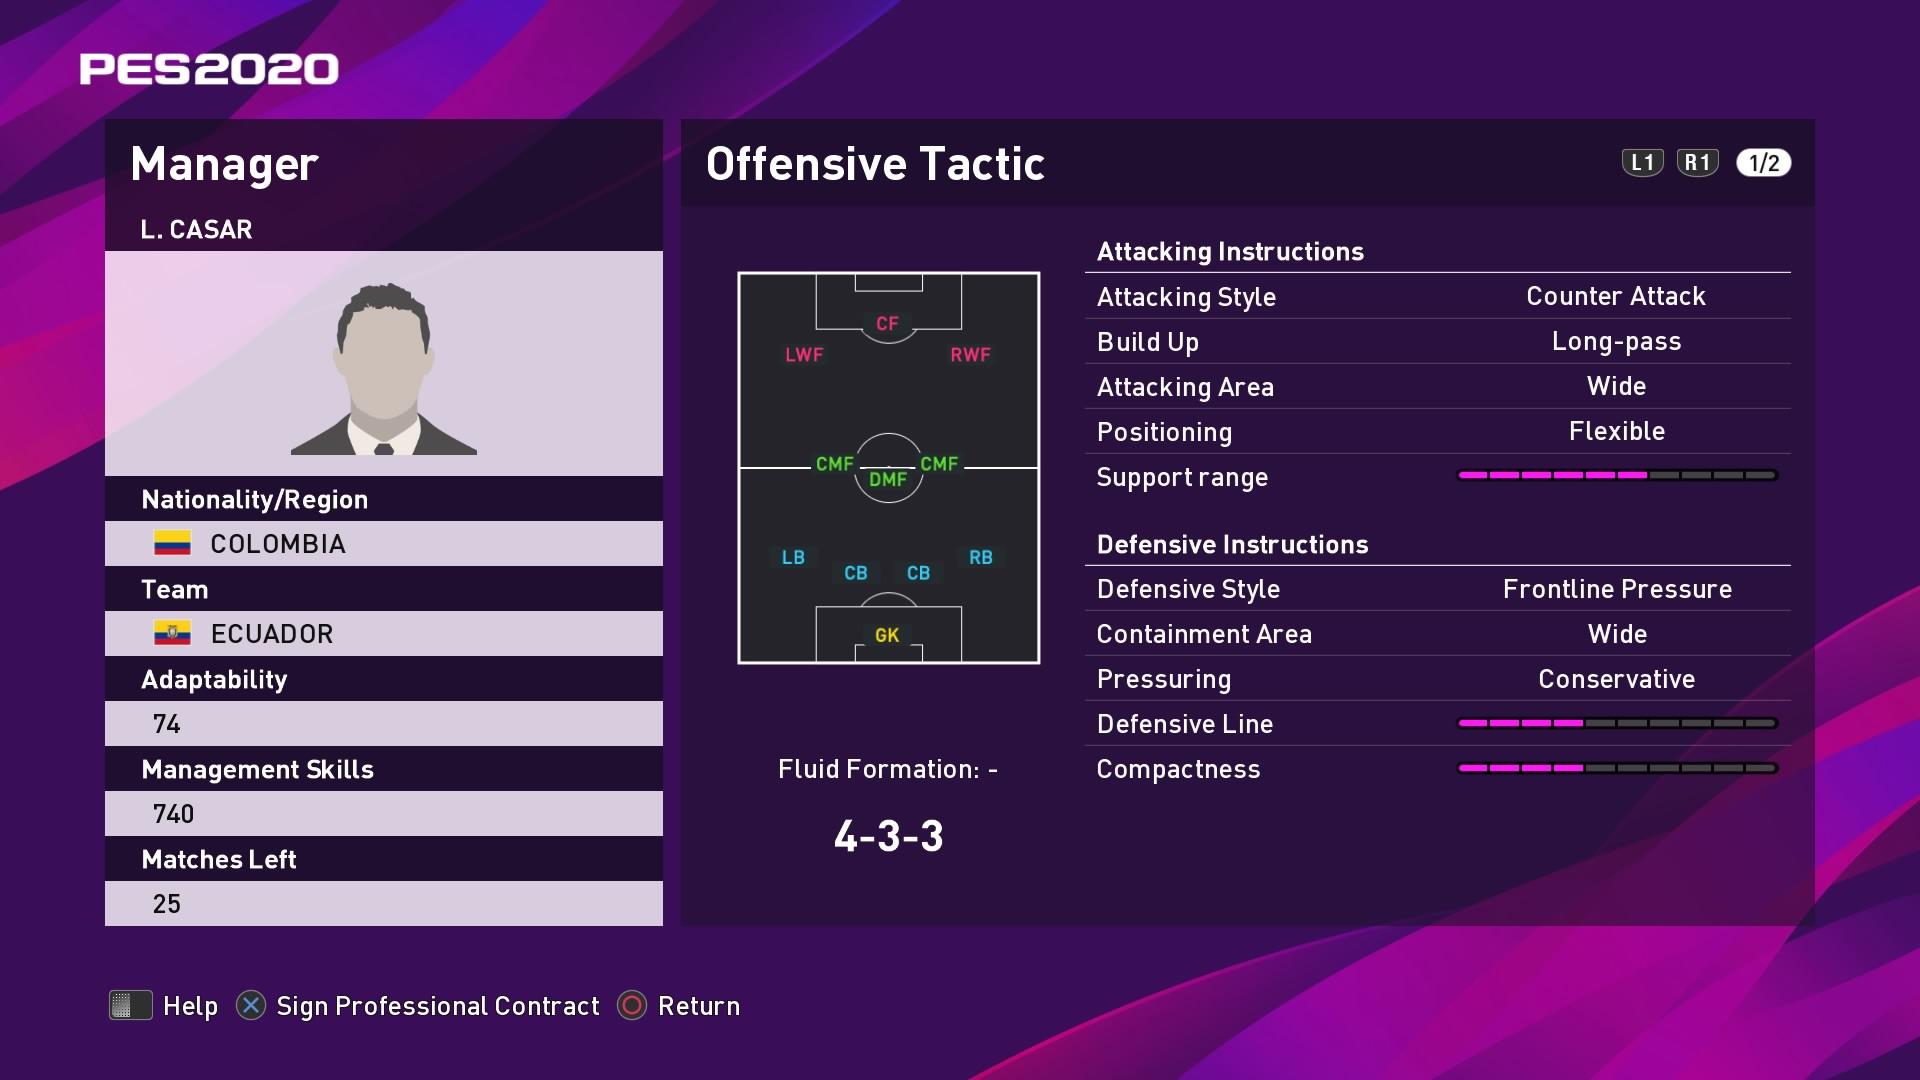 L. Casar (Hernán Darío Gómez) Offensive Tactic in PES 2020 myClub